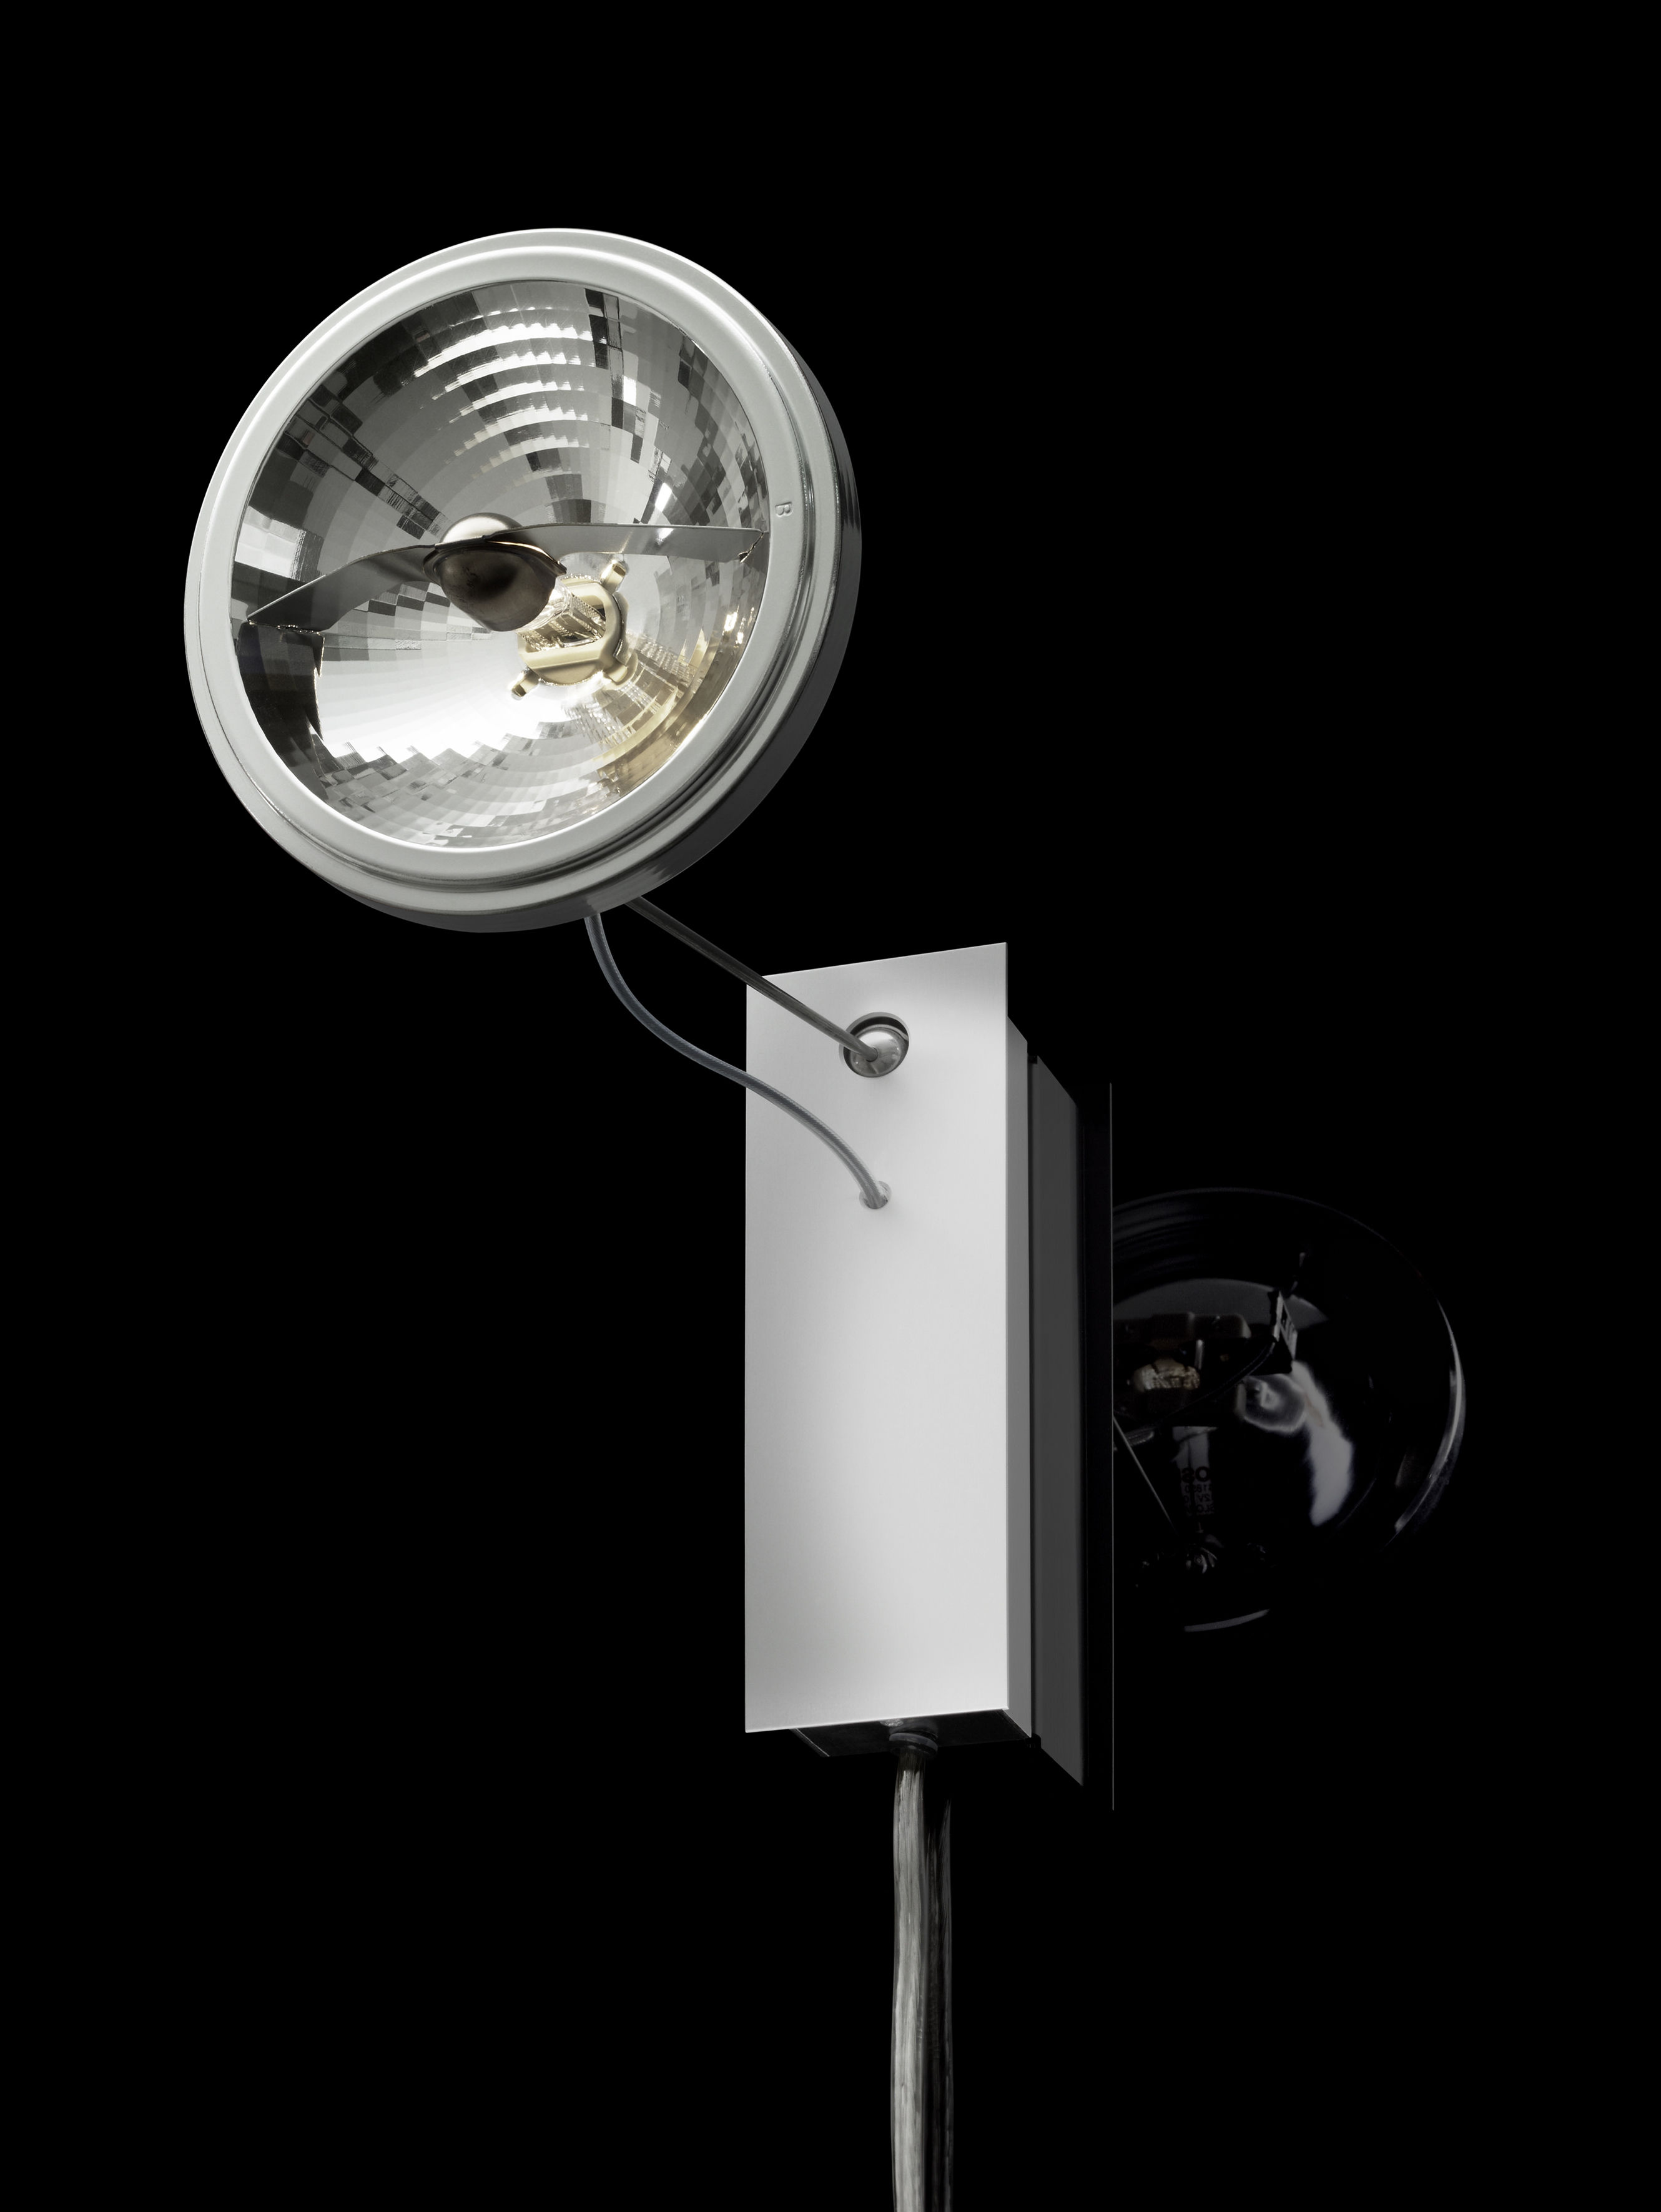 Lighting - Wall Lights - Use me W. Wall light with plug - Wall lamp by Ingo Maurer - Aluminium & steel - Steel